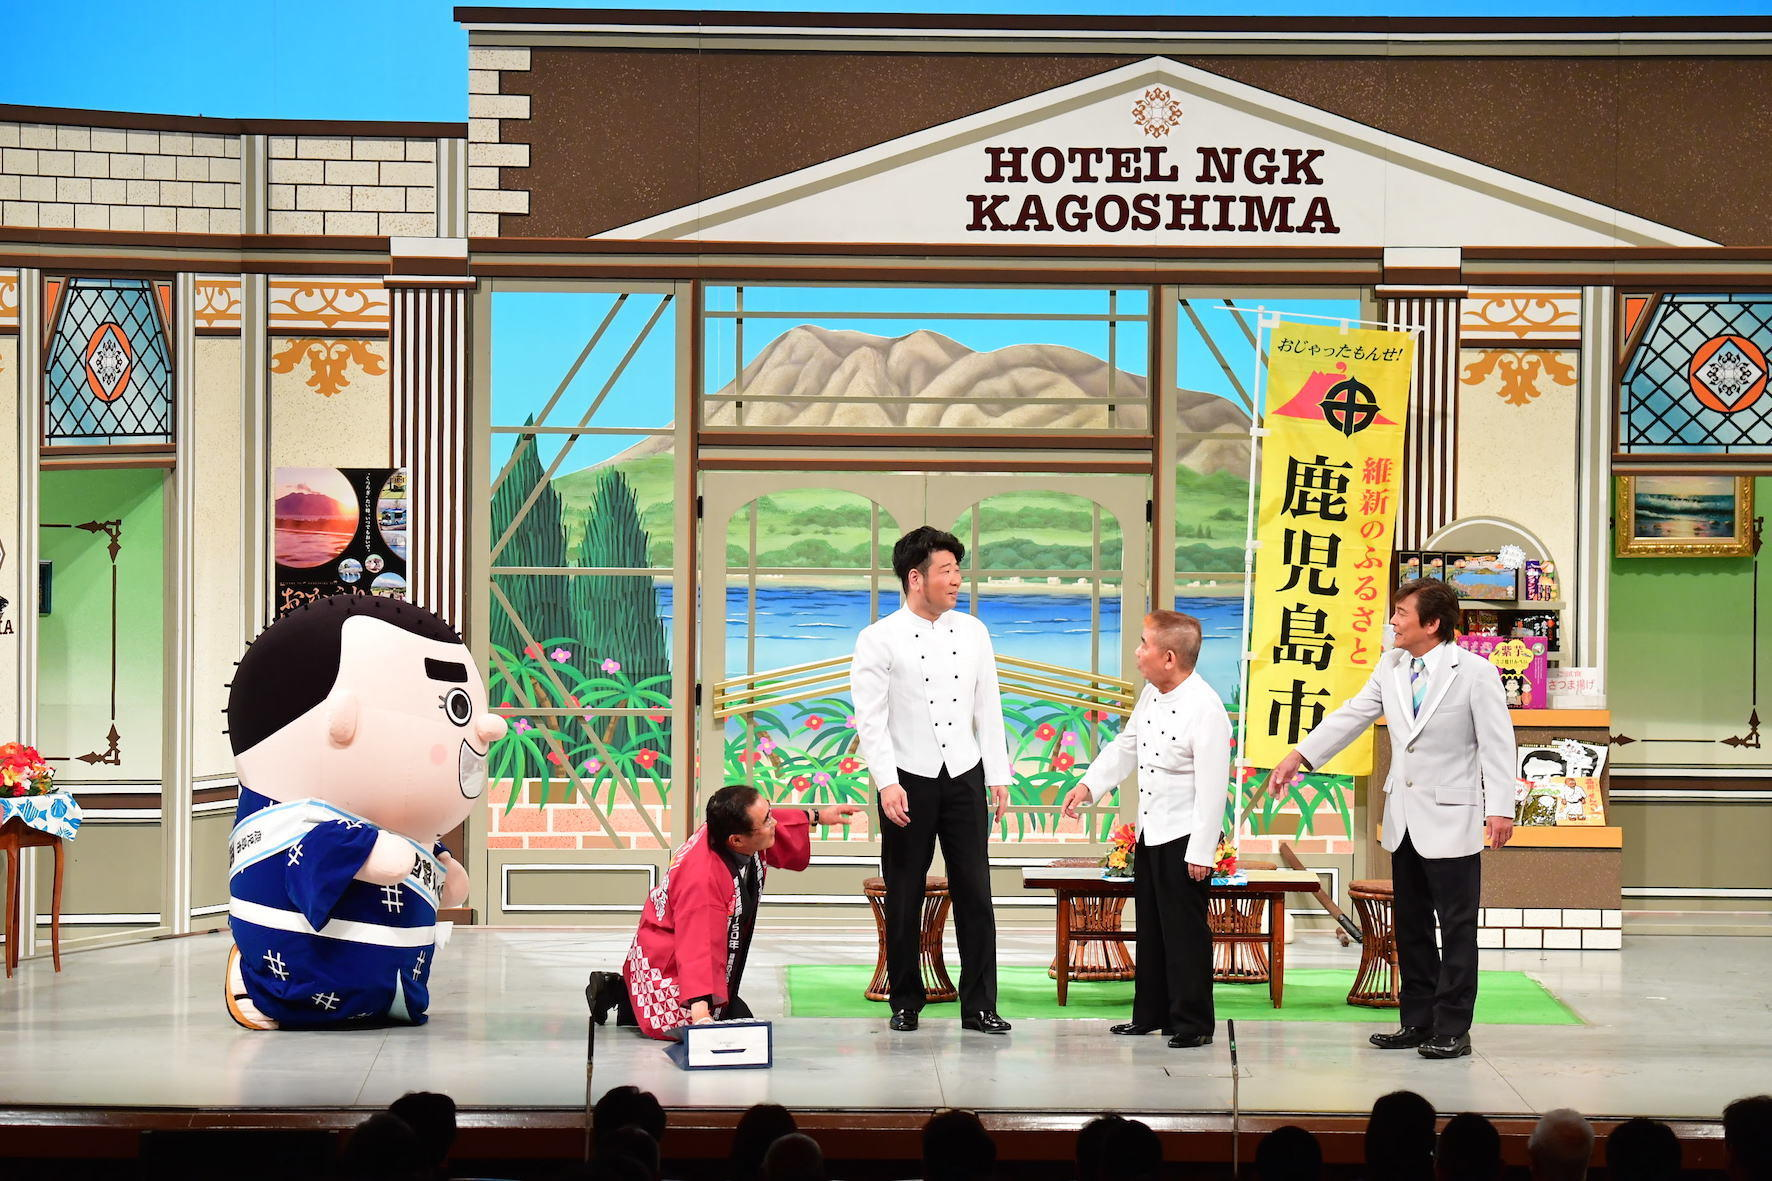 http://news.yoshimoto.co.jp/20180720185958-a4c4063f82a0b0370e2de95c21beab4c3e39cfbc.jpg